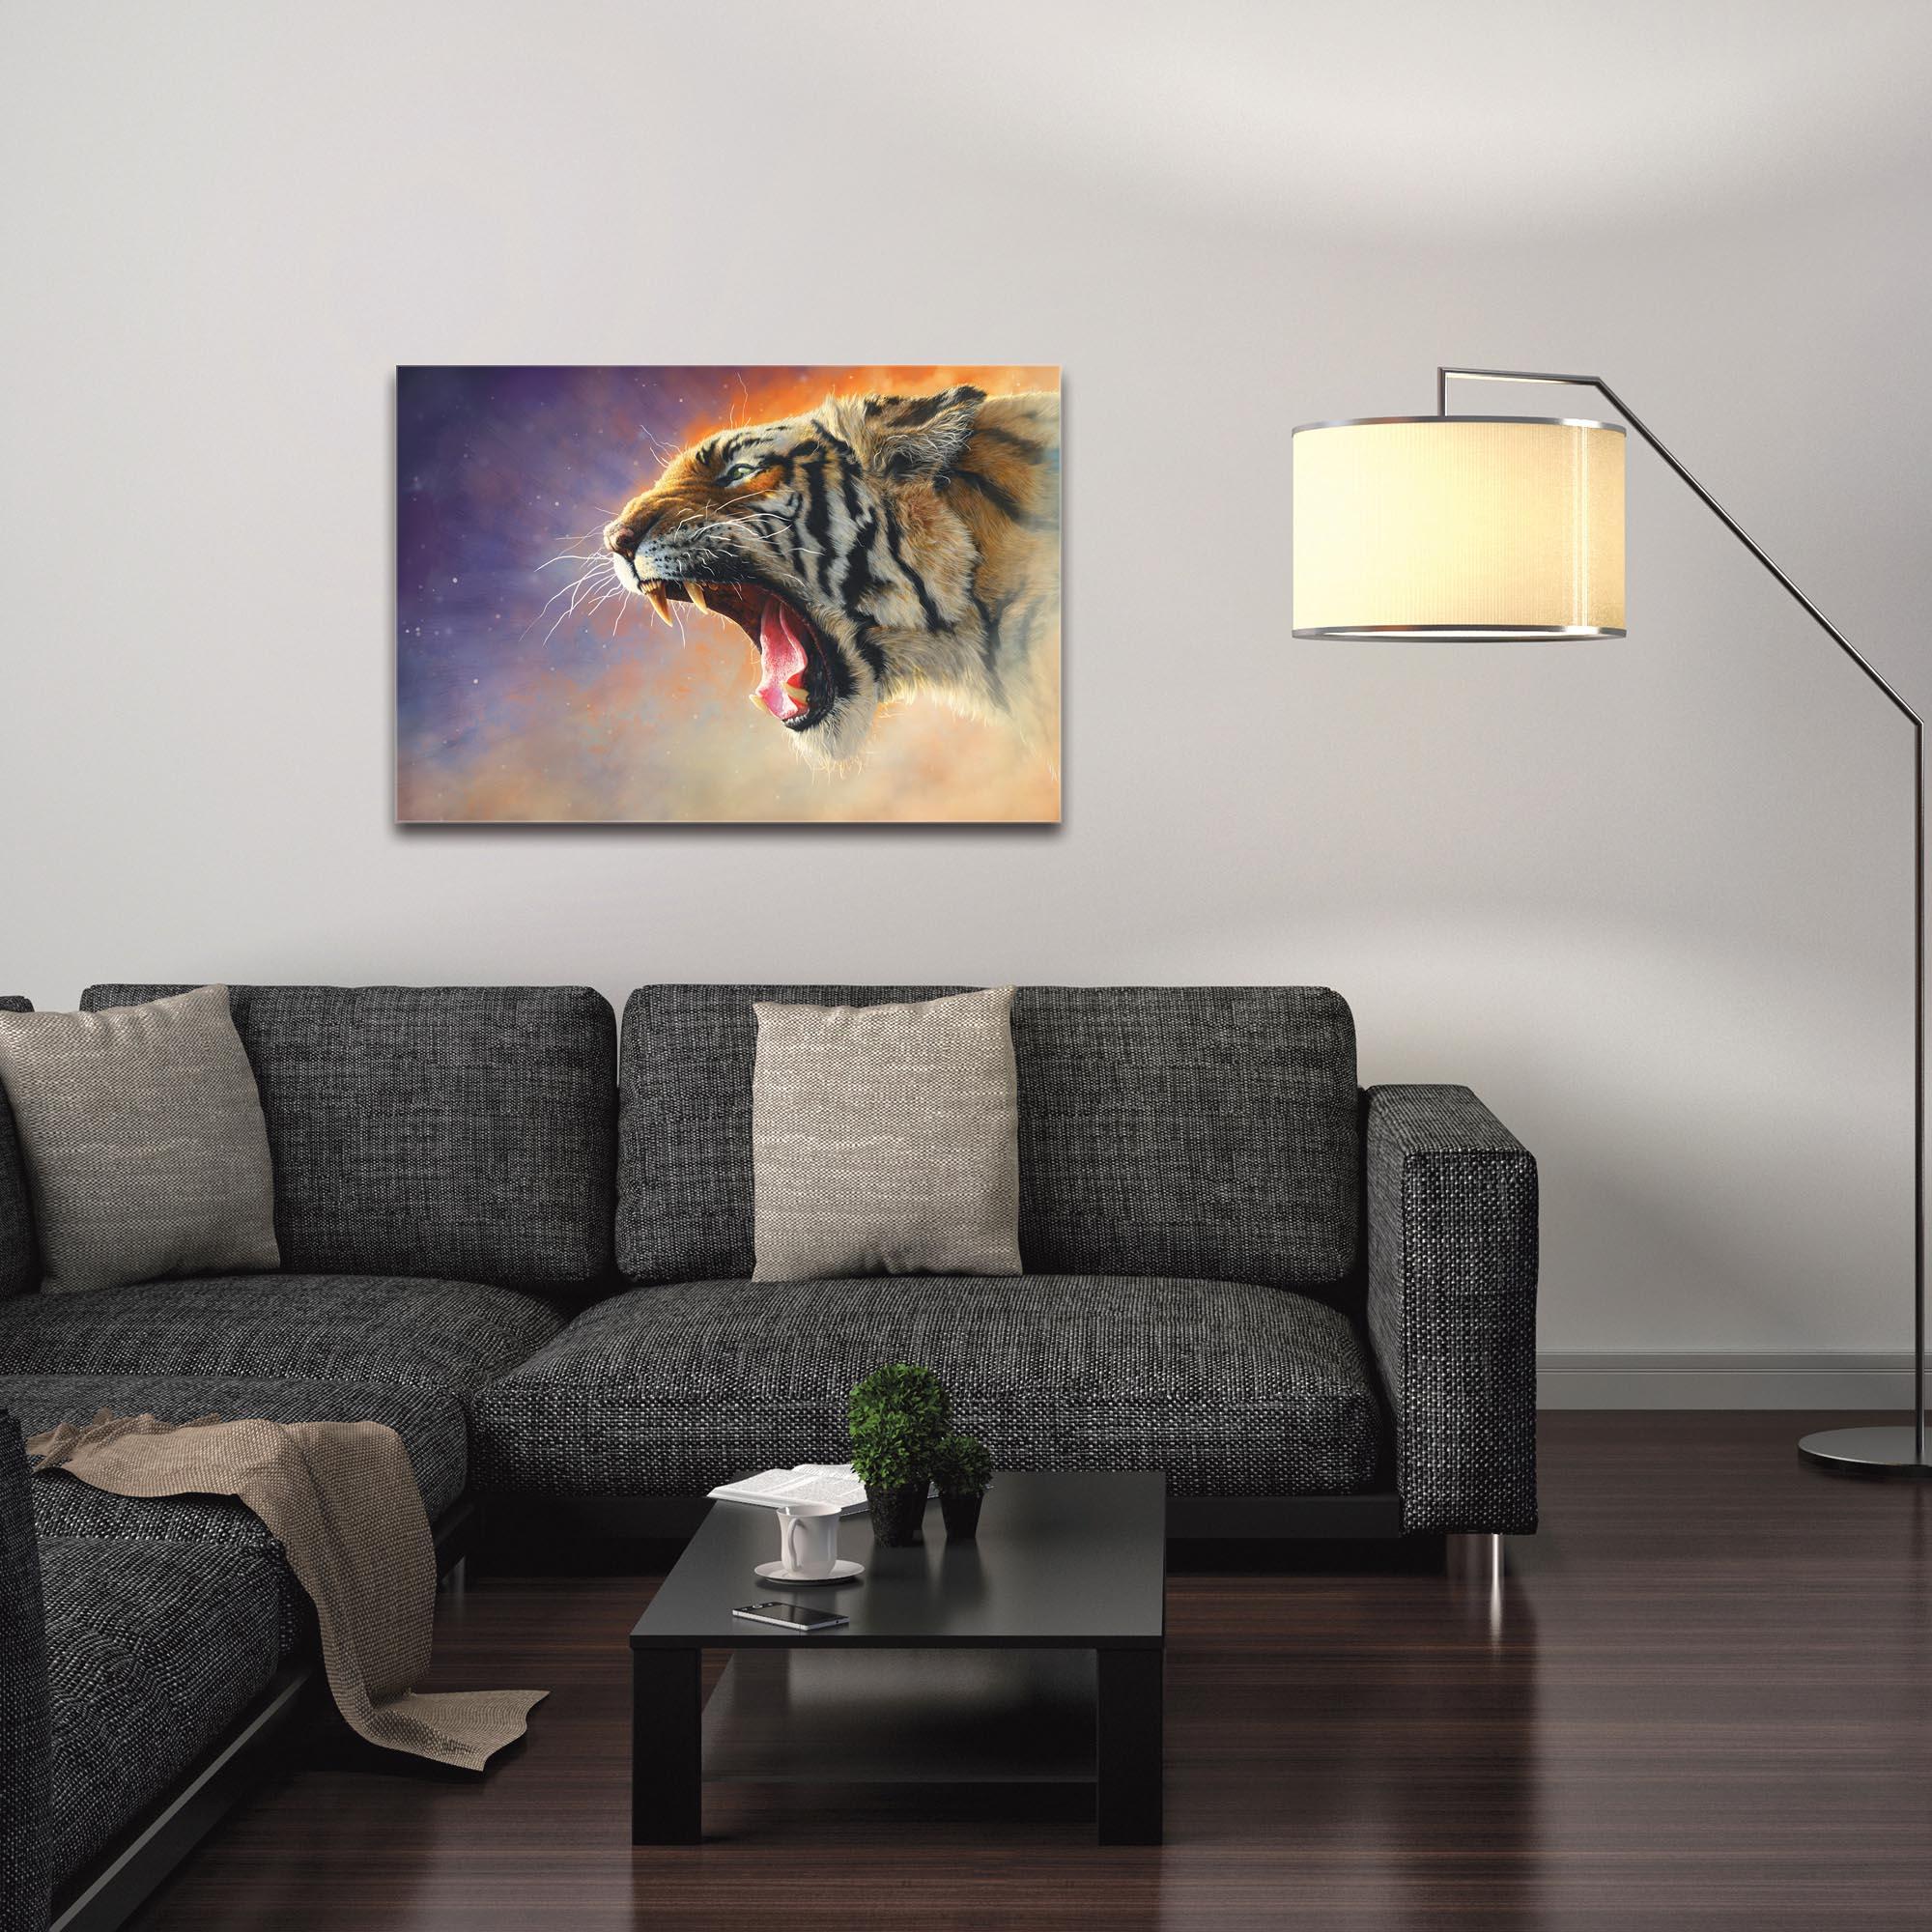 Expressionist Wall Art 'Fear Me' - Wildlife Decor on Metal or Plexiglass - Image 3